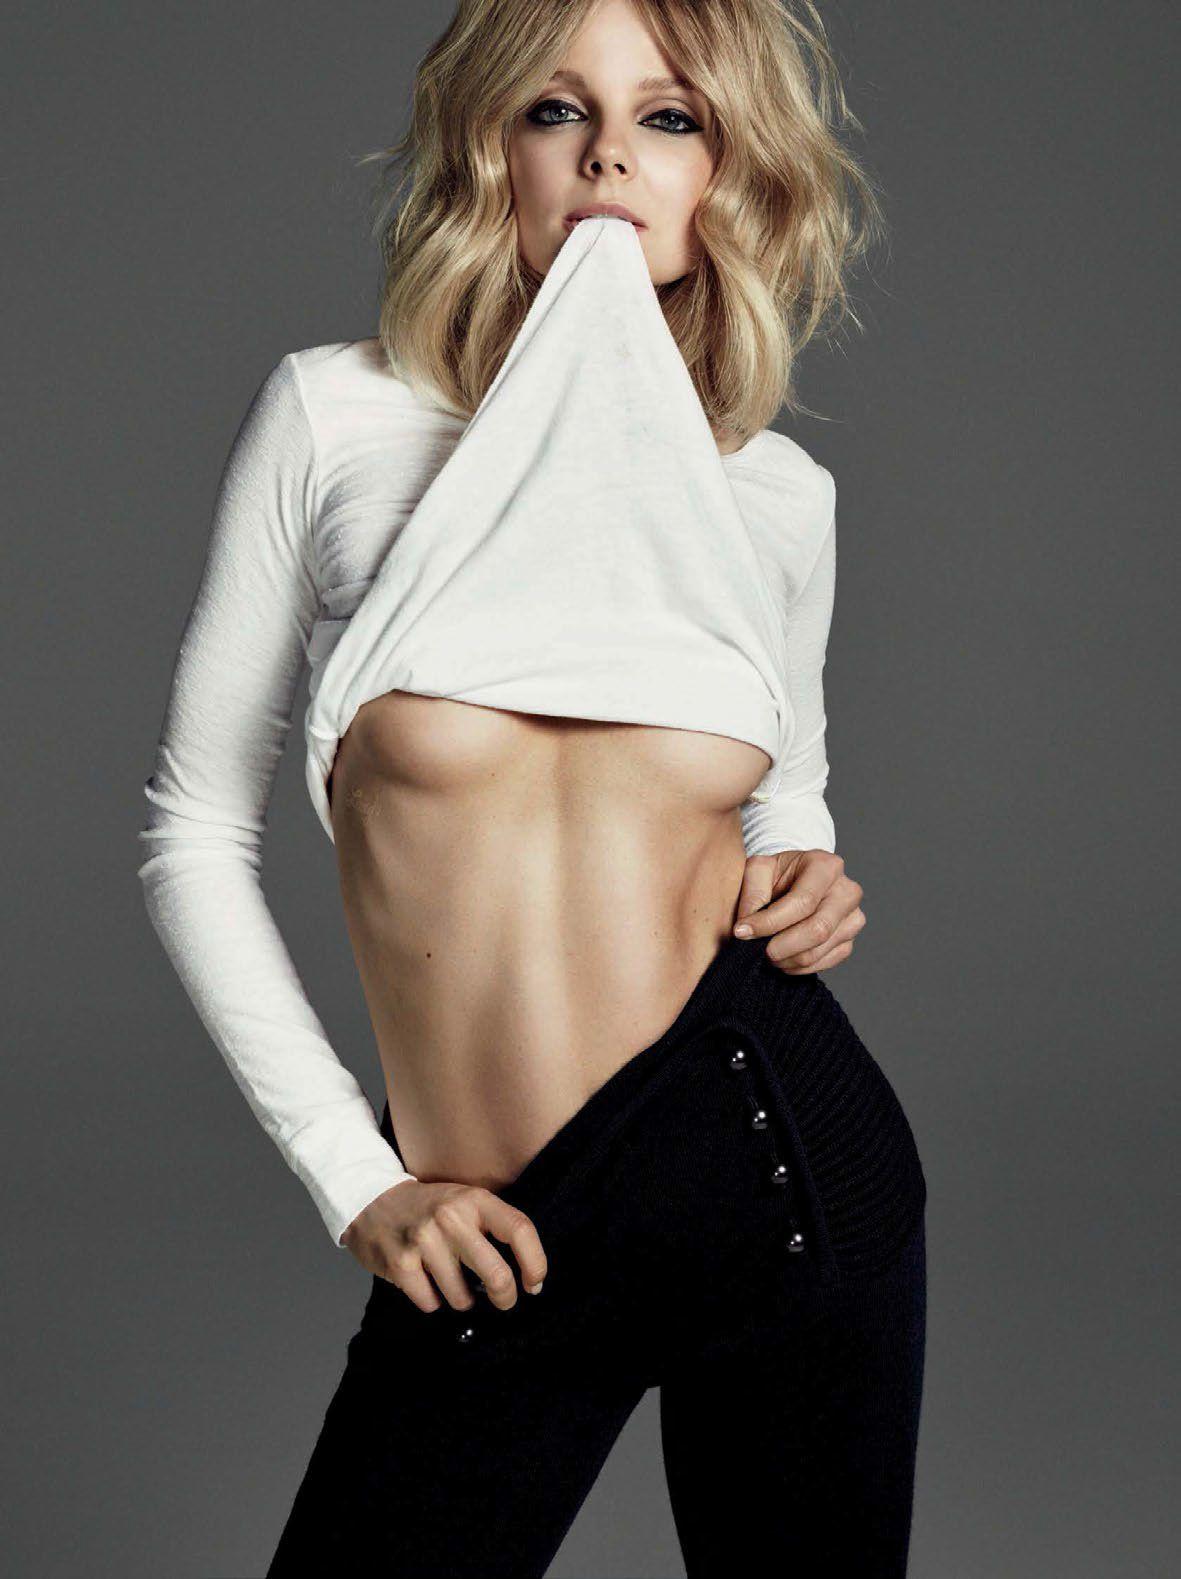 Eniko-Mihalik-Sexy-2